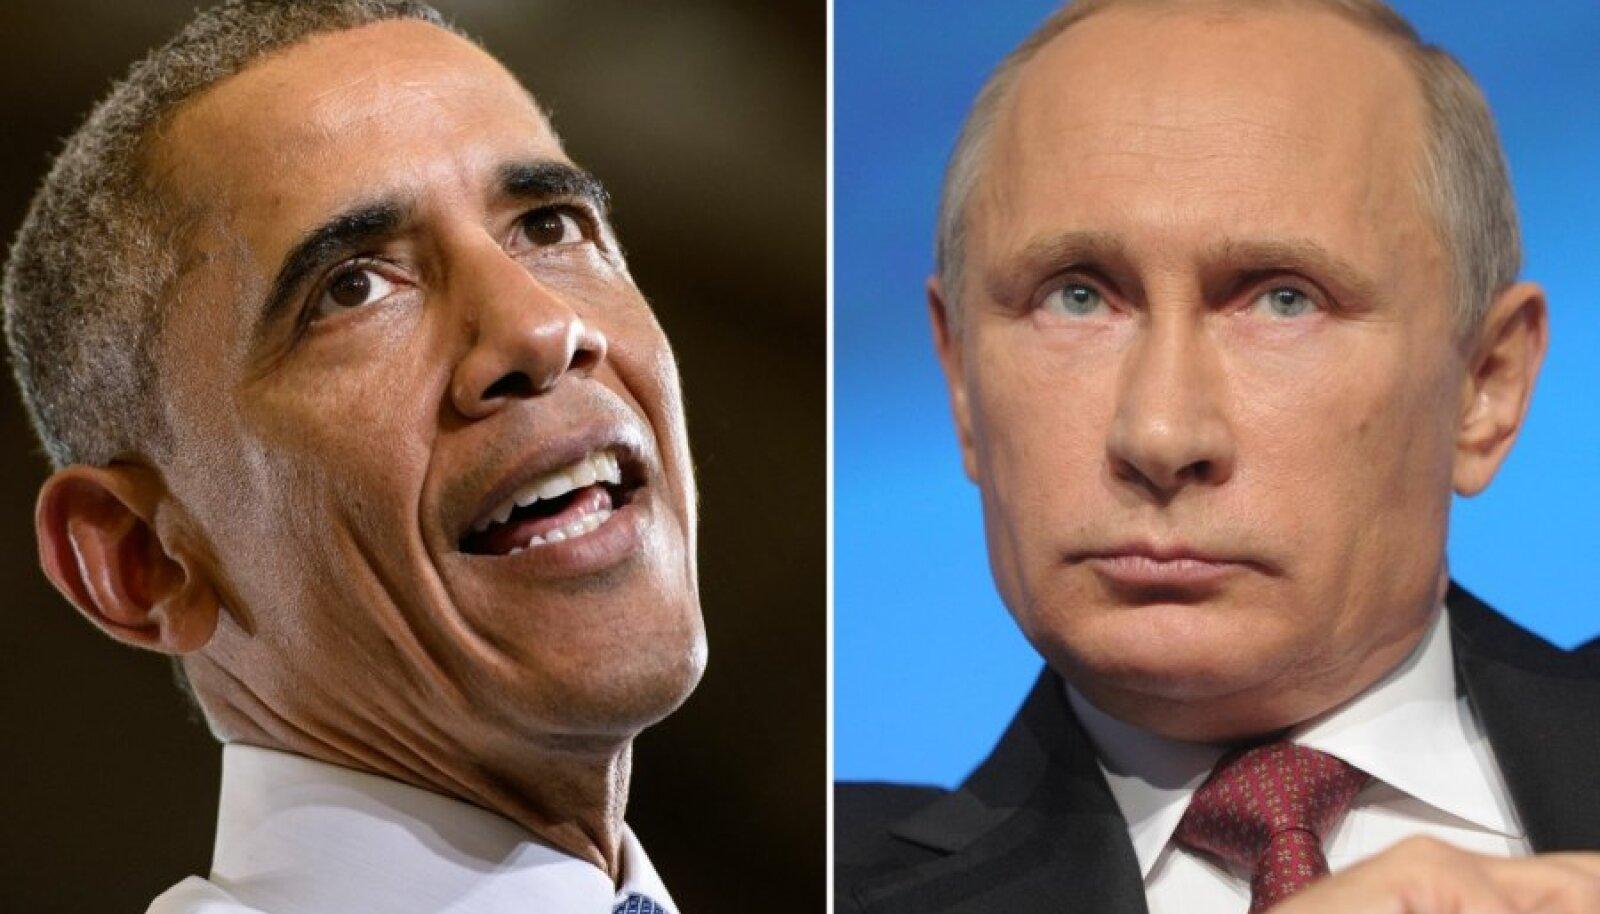 Venemaa president Vladimir Putin ja USA president Barack Obama.